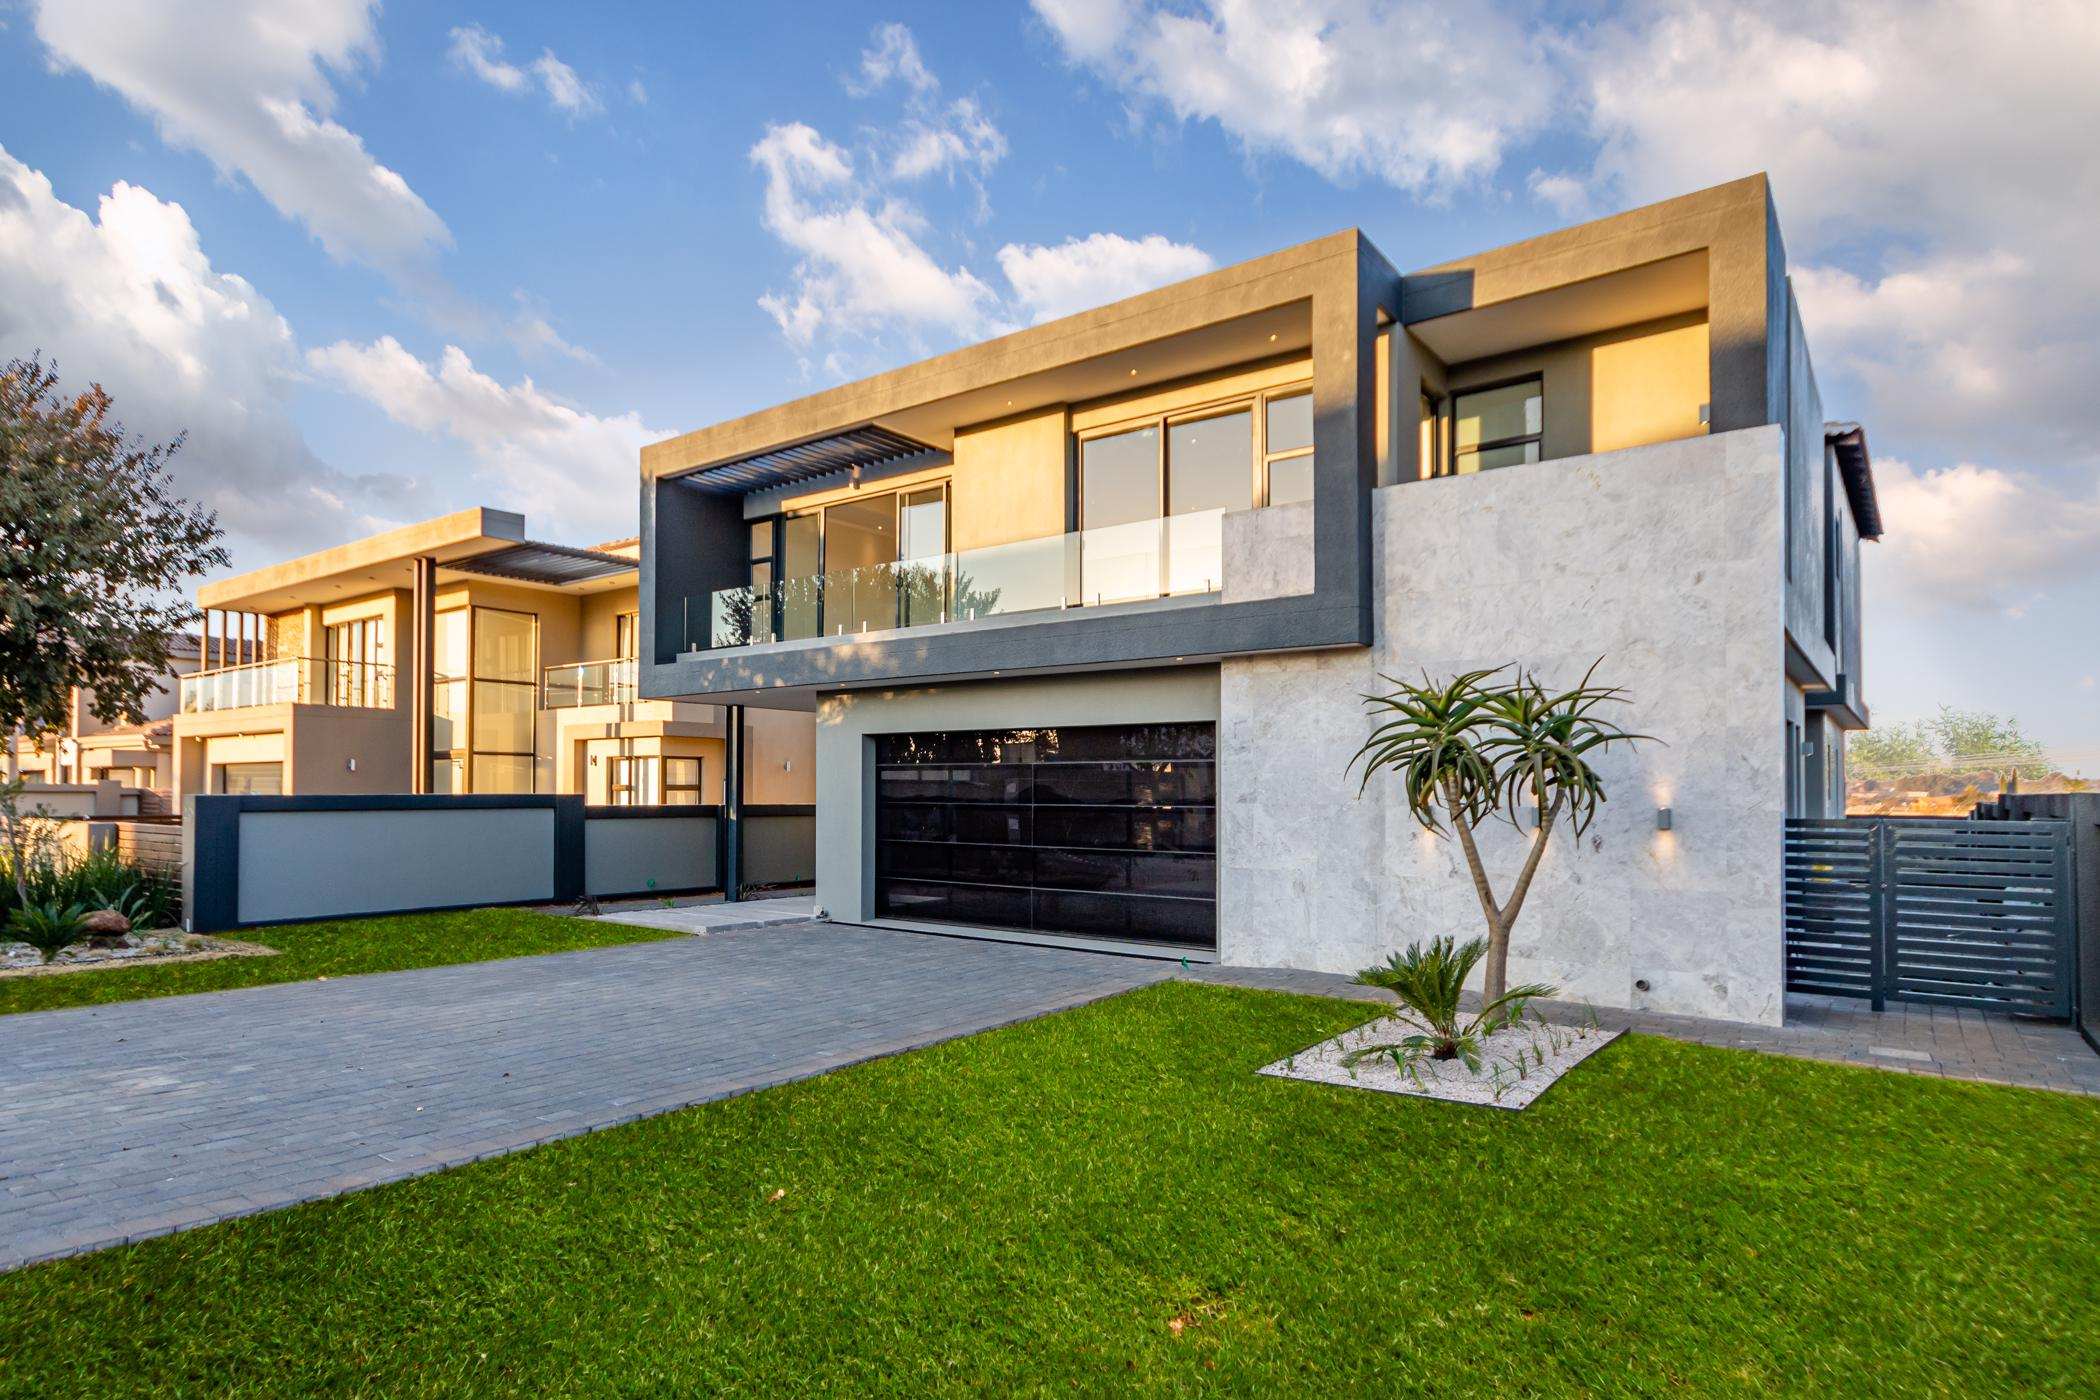 4 Bedroom House For Sale | La Como Lifestyle Estate ...